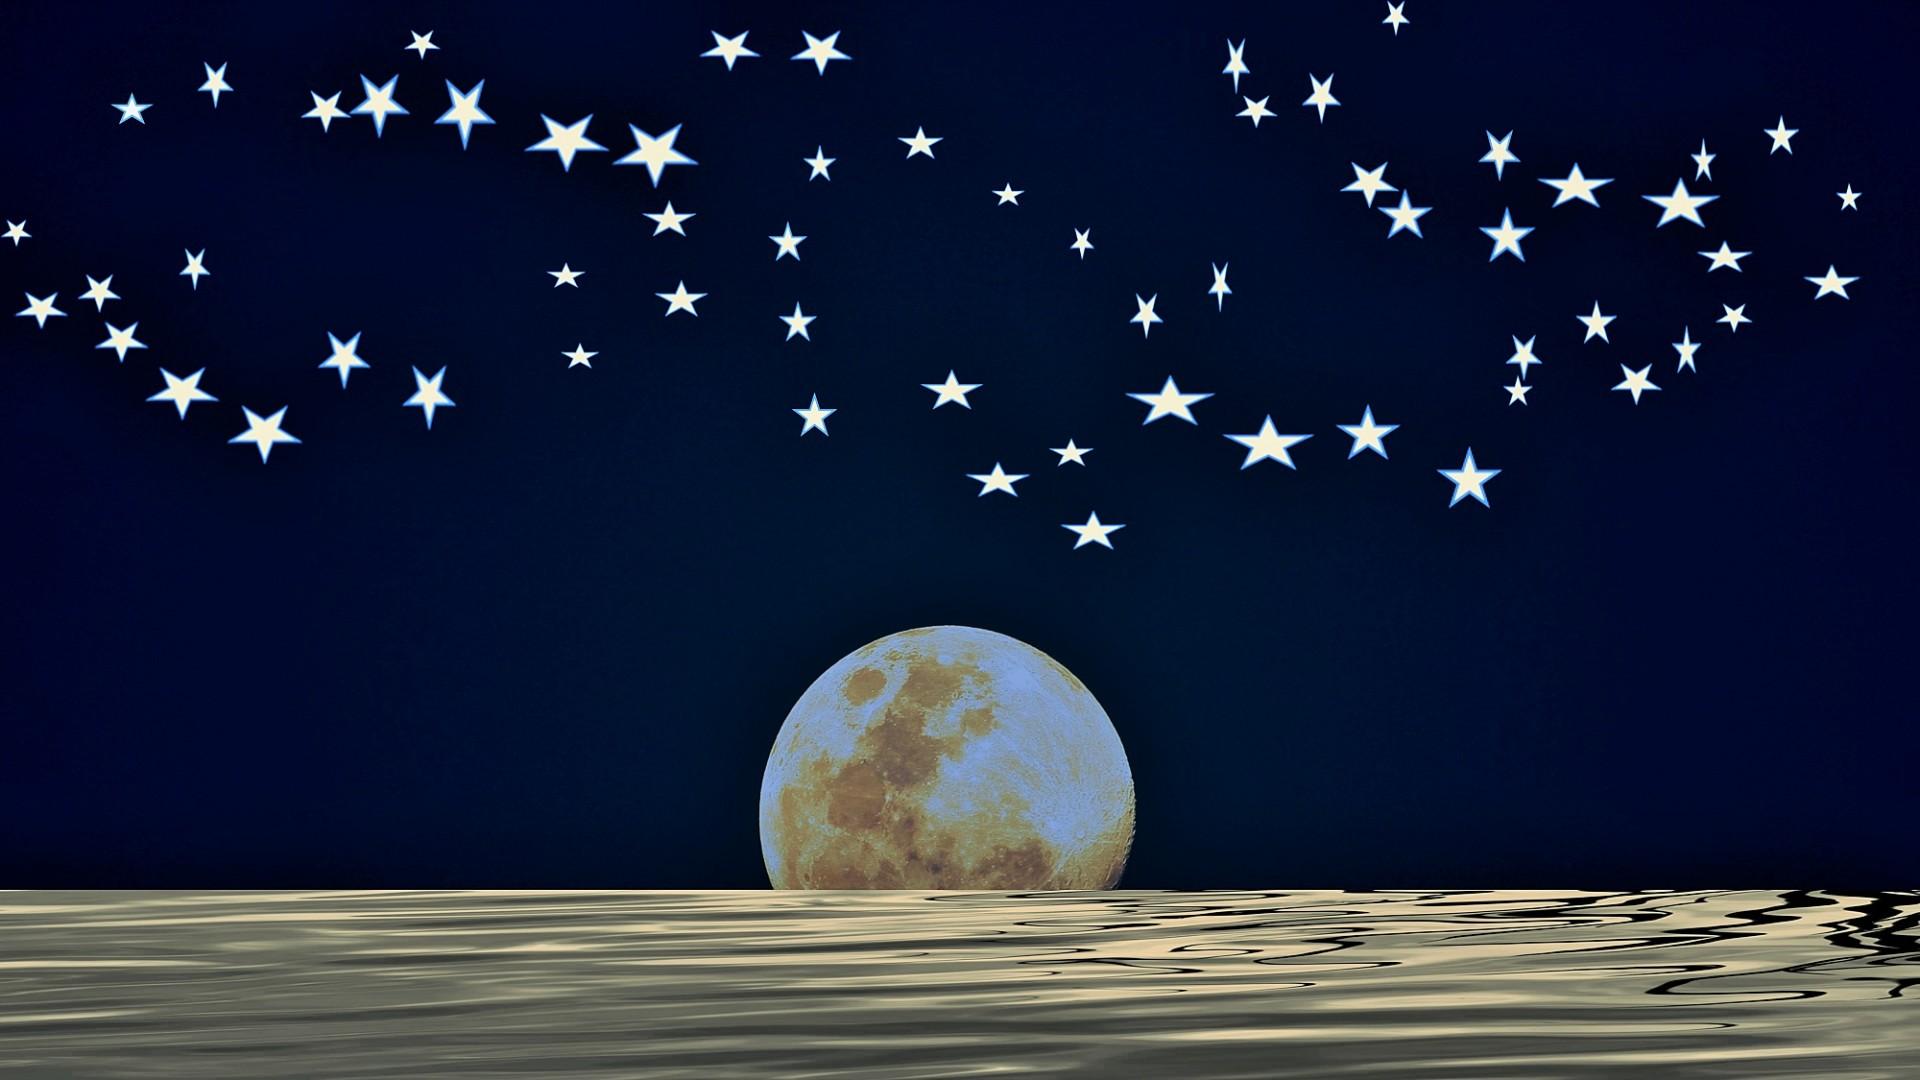 Sweet Wallpaper Hd Full Moon With Midnight Sky Free Stock Photo Public